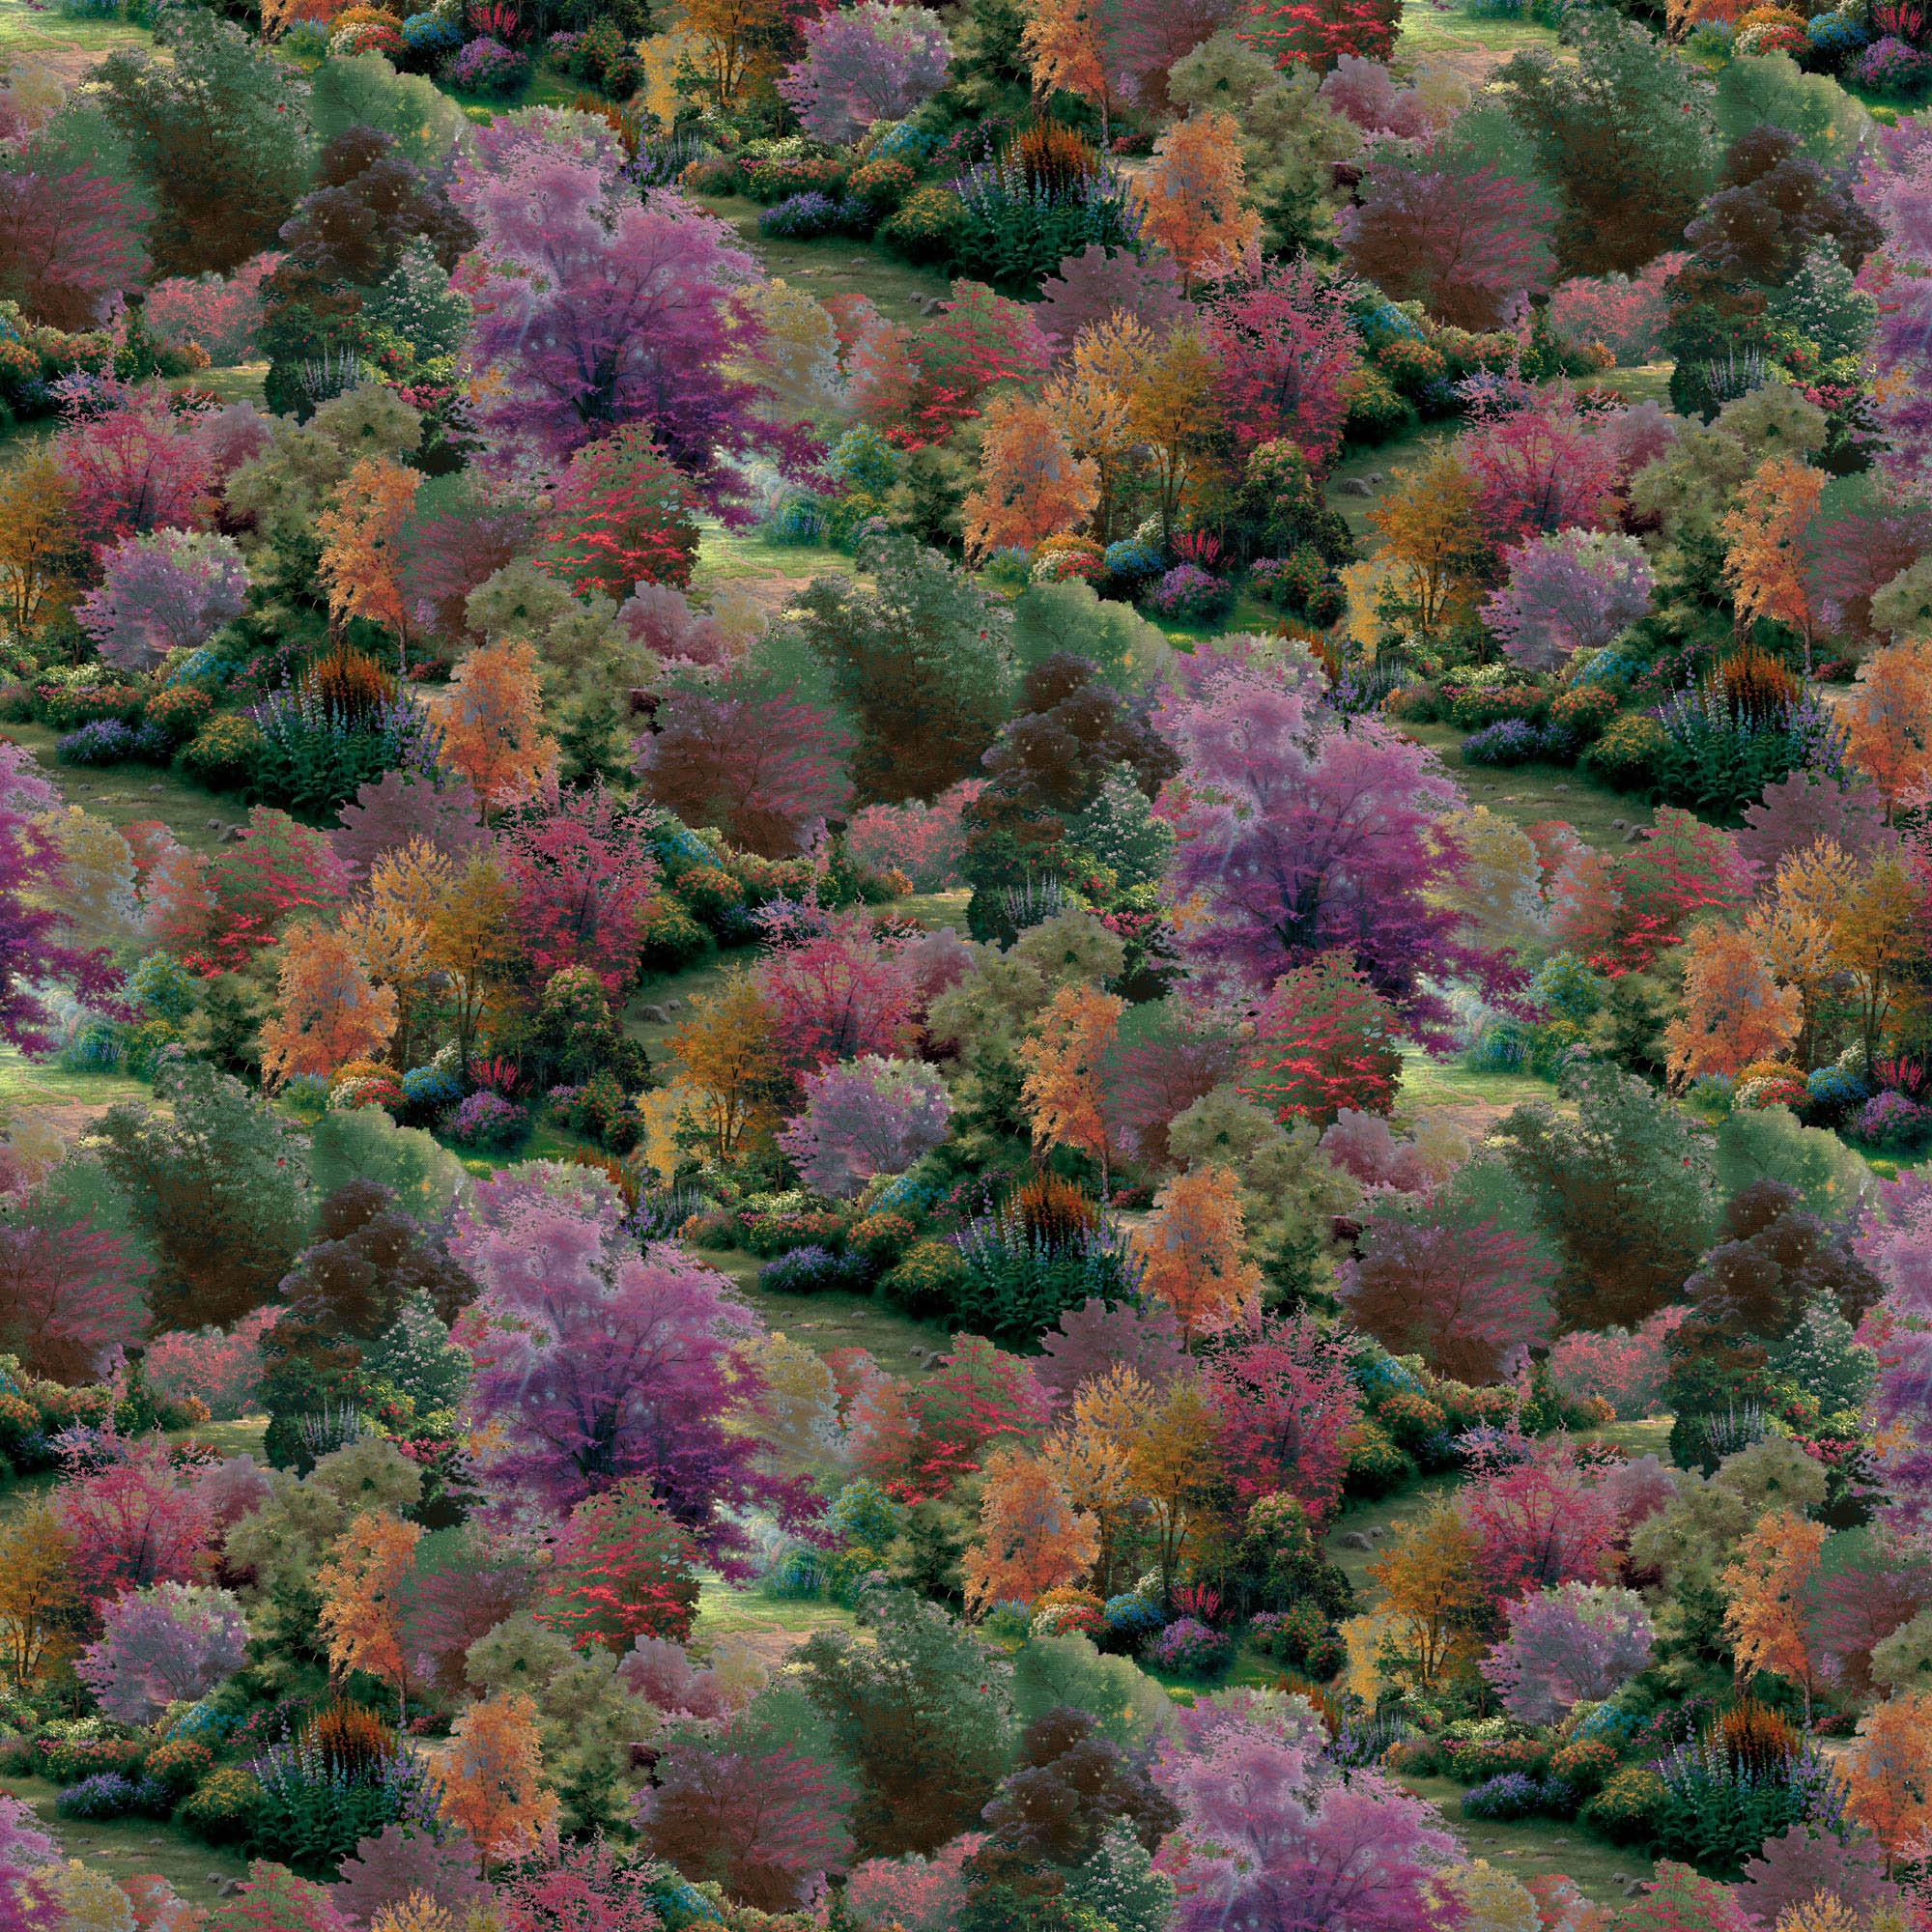 David Textiles, Inc. Thomas Kinkade Spring Landscape Cotton Fabric By The Yard